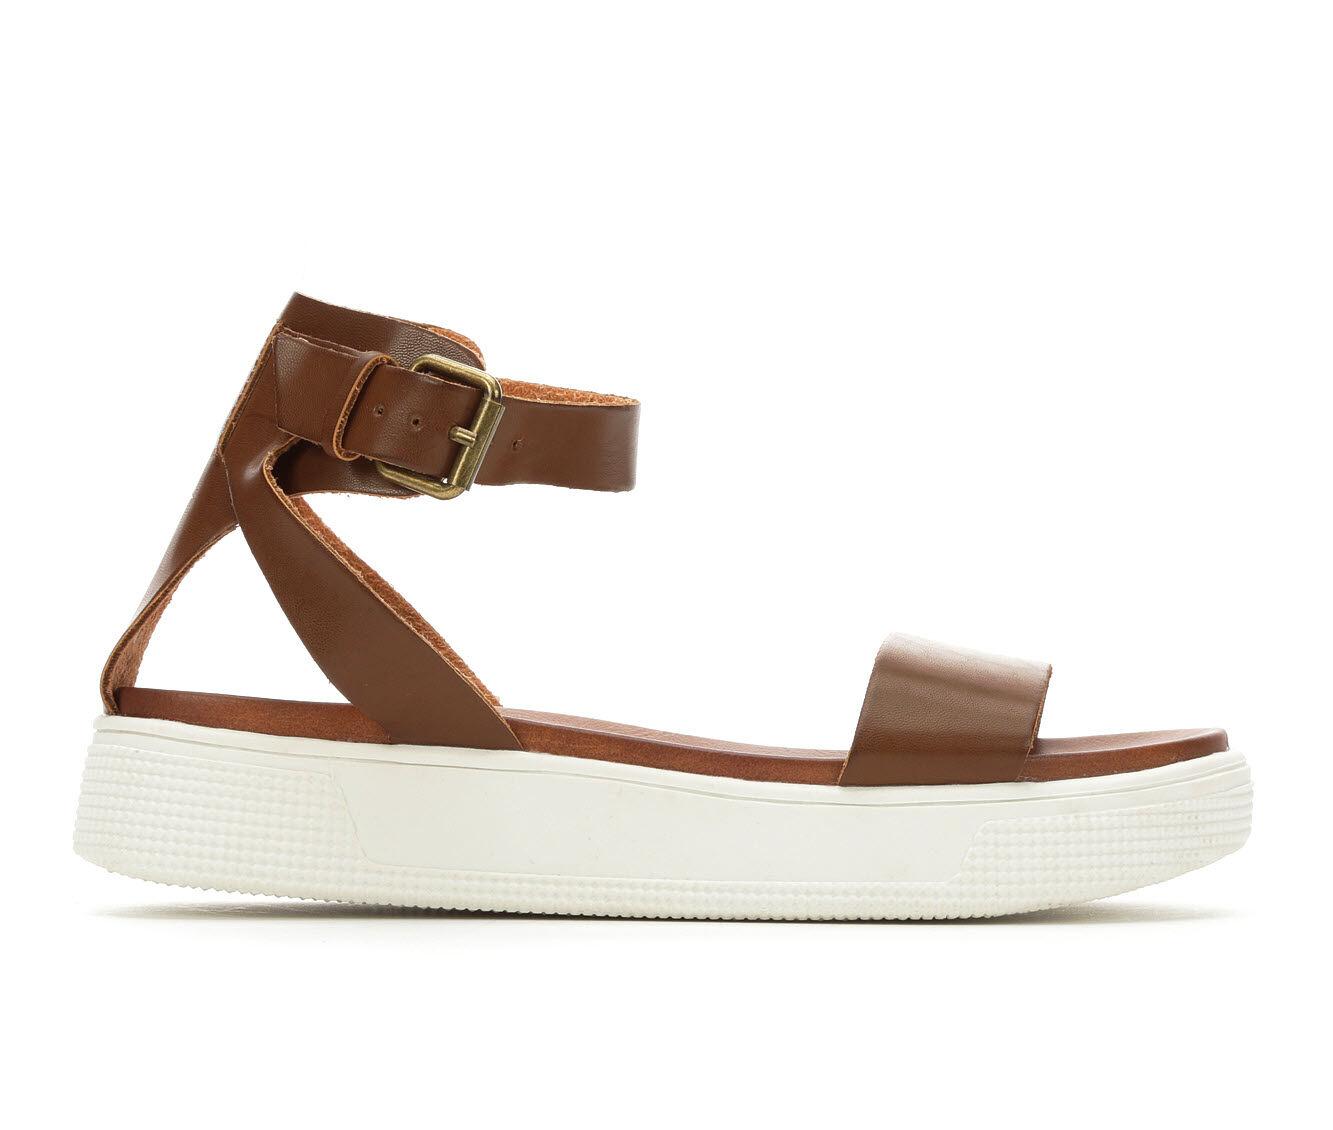 uk shoes_kd6851